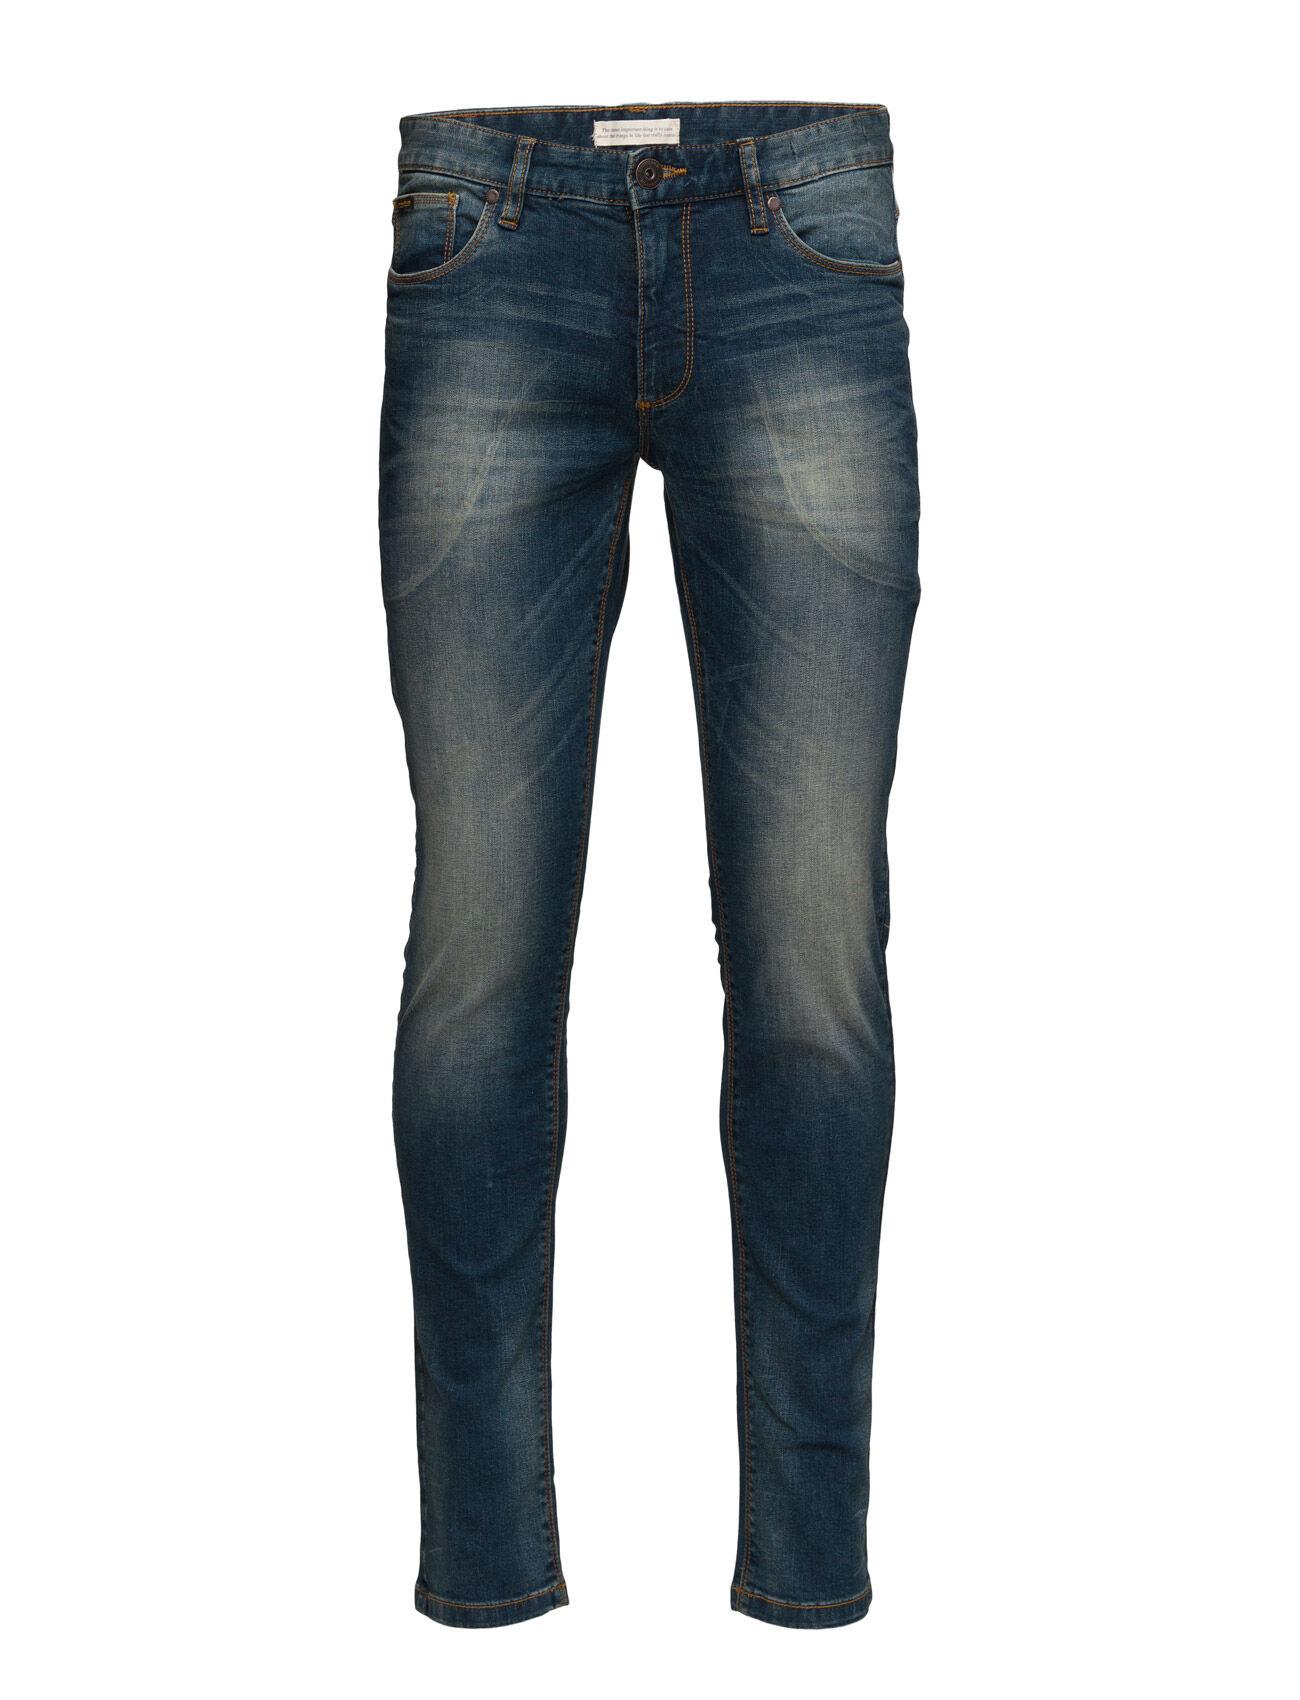 Lindbergh Tapered Fit Jeans Origin Blue